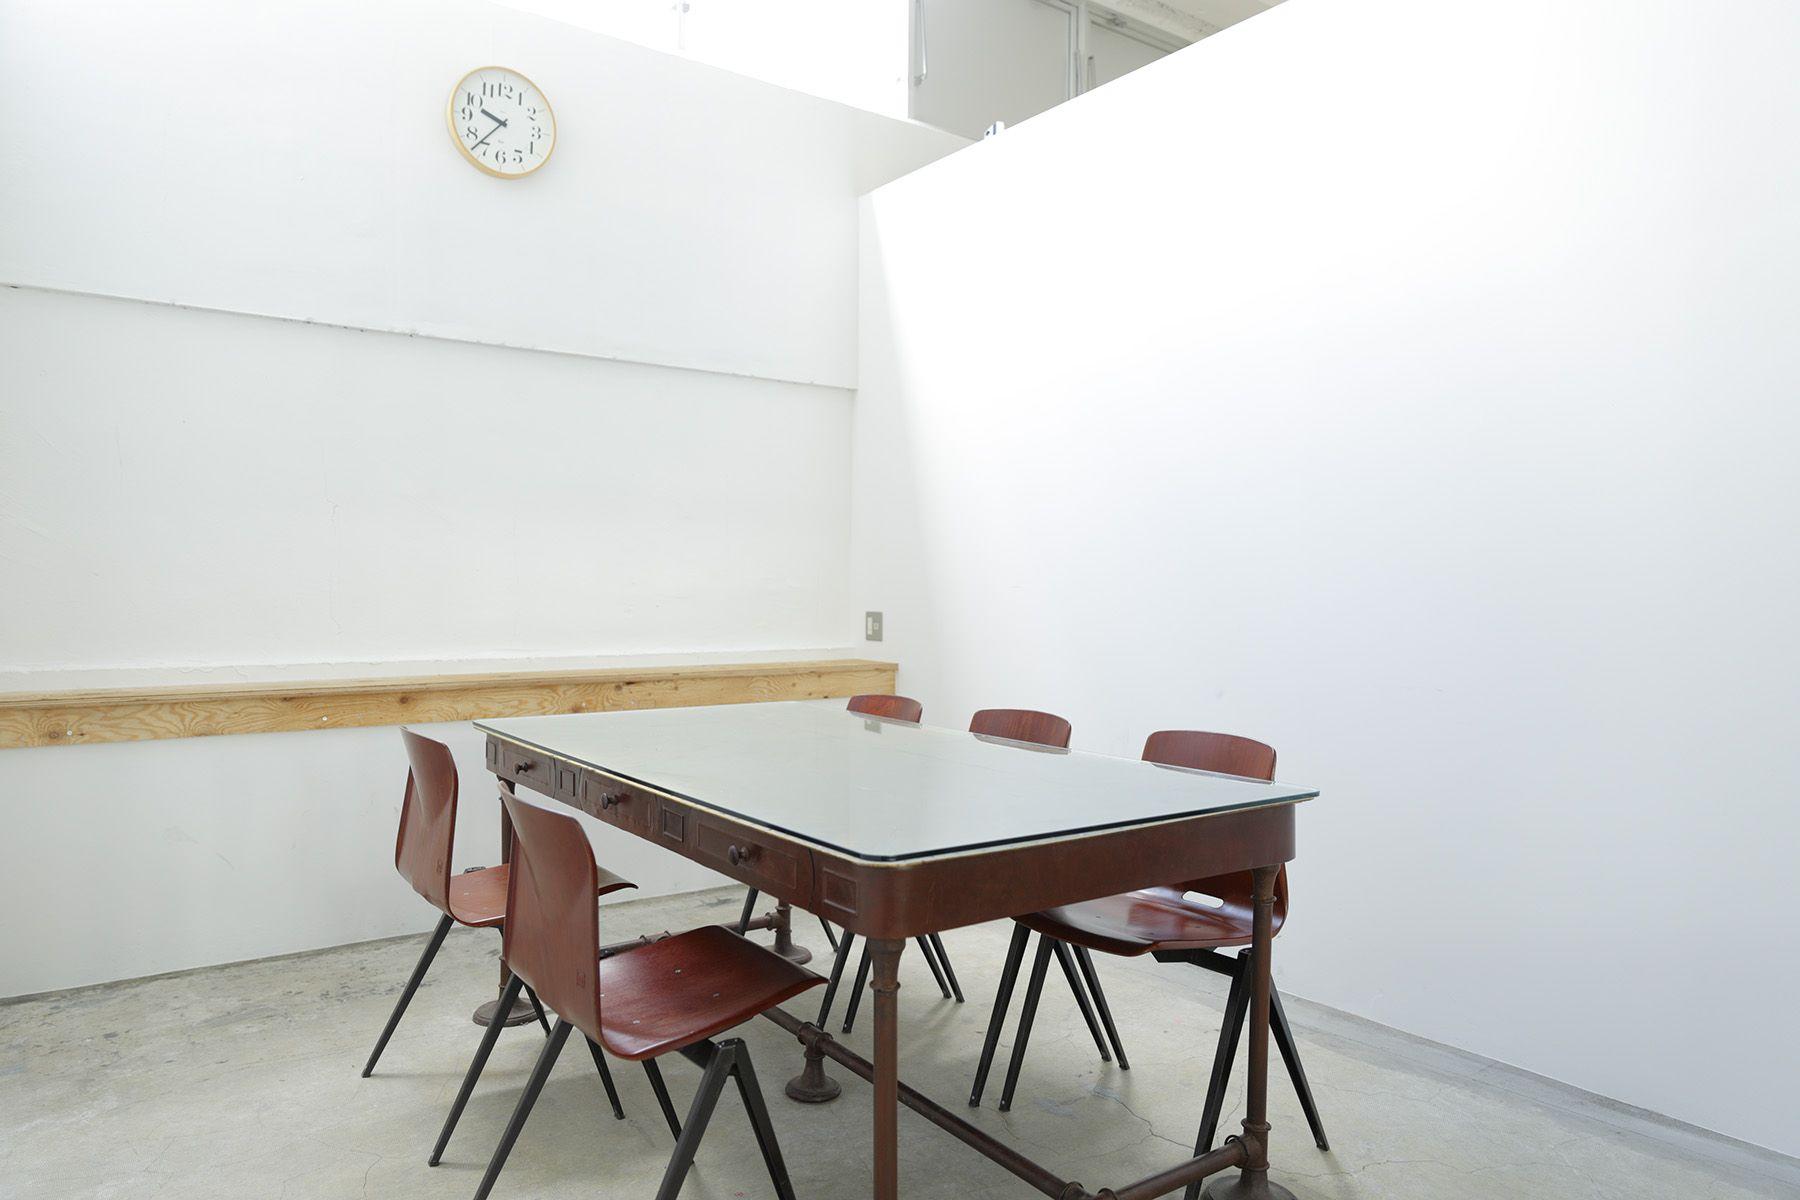 Studio Roaster (スタジオ ロースター)meeting room